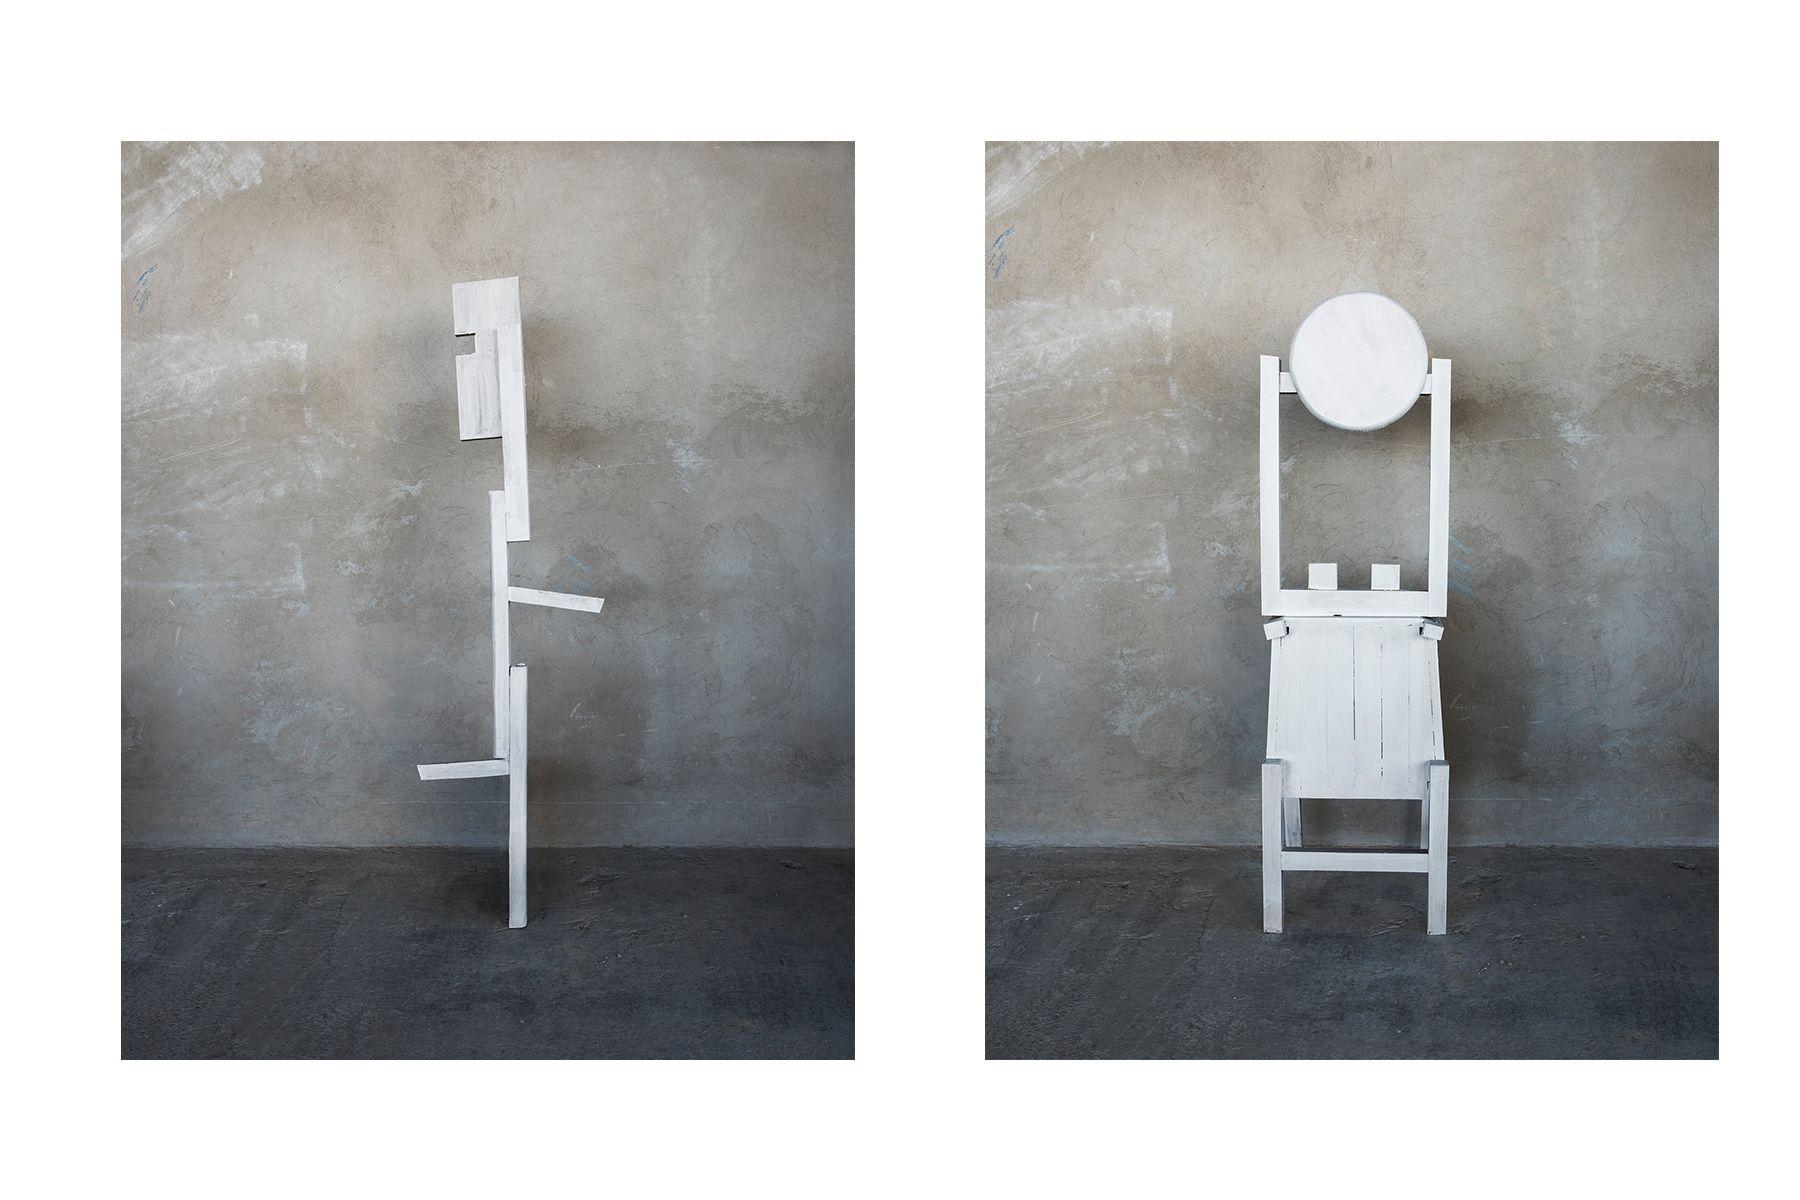 Furniture Totem (#5 left, #1, right)